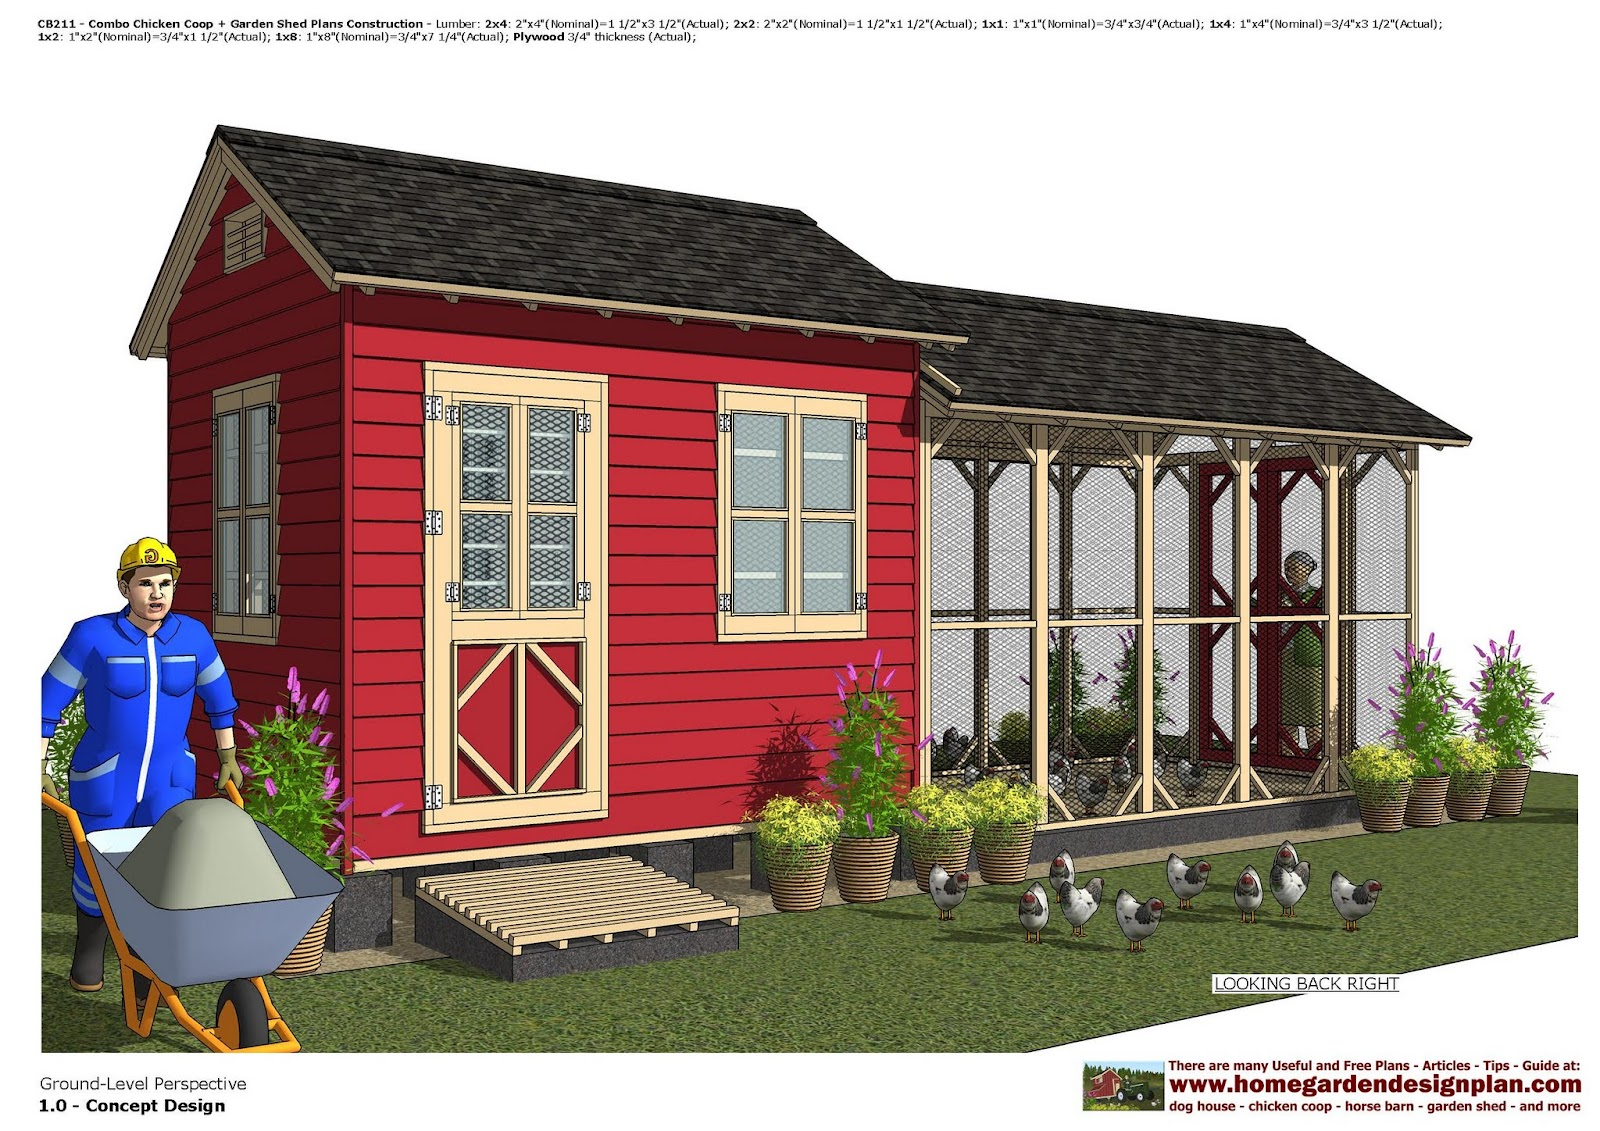 Home Garden Plans CB211 Combo Chicken Coop Garden